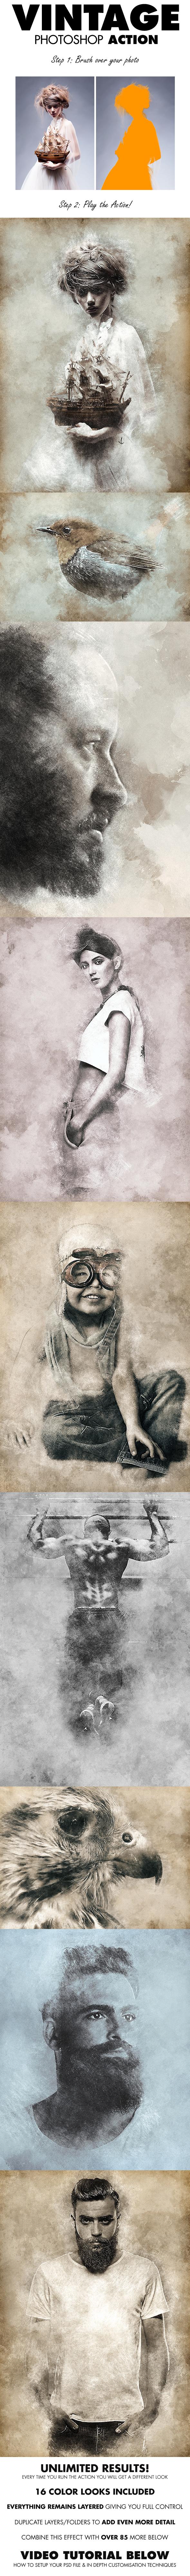 http://i1377.photobucket.com/albums/ah44/sevenstyles/Artist zps0v7m6phf.png